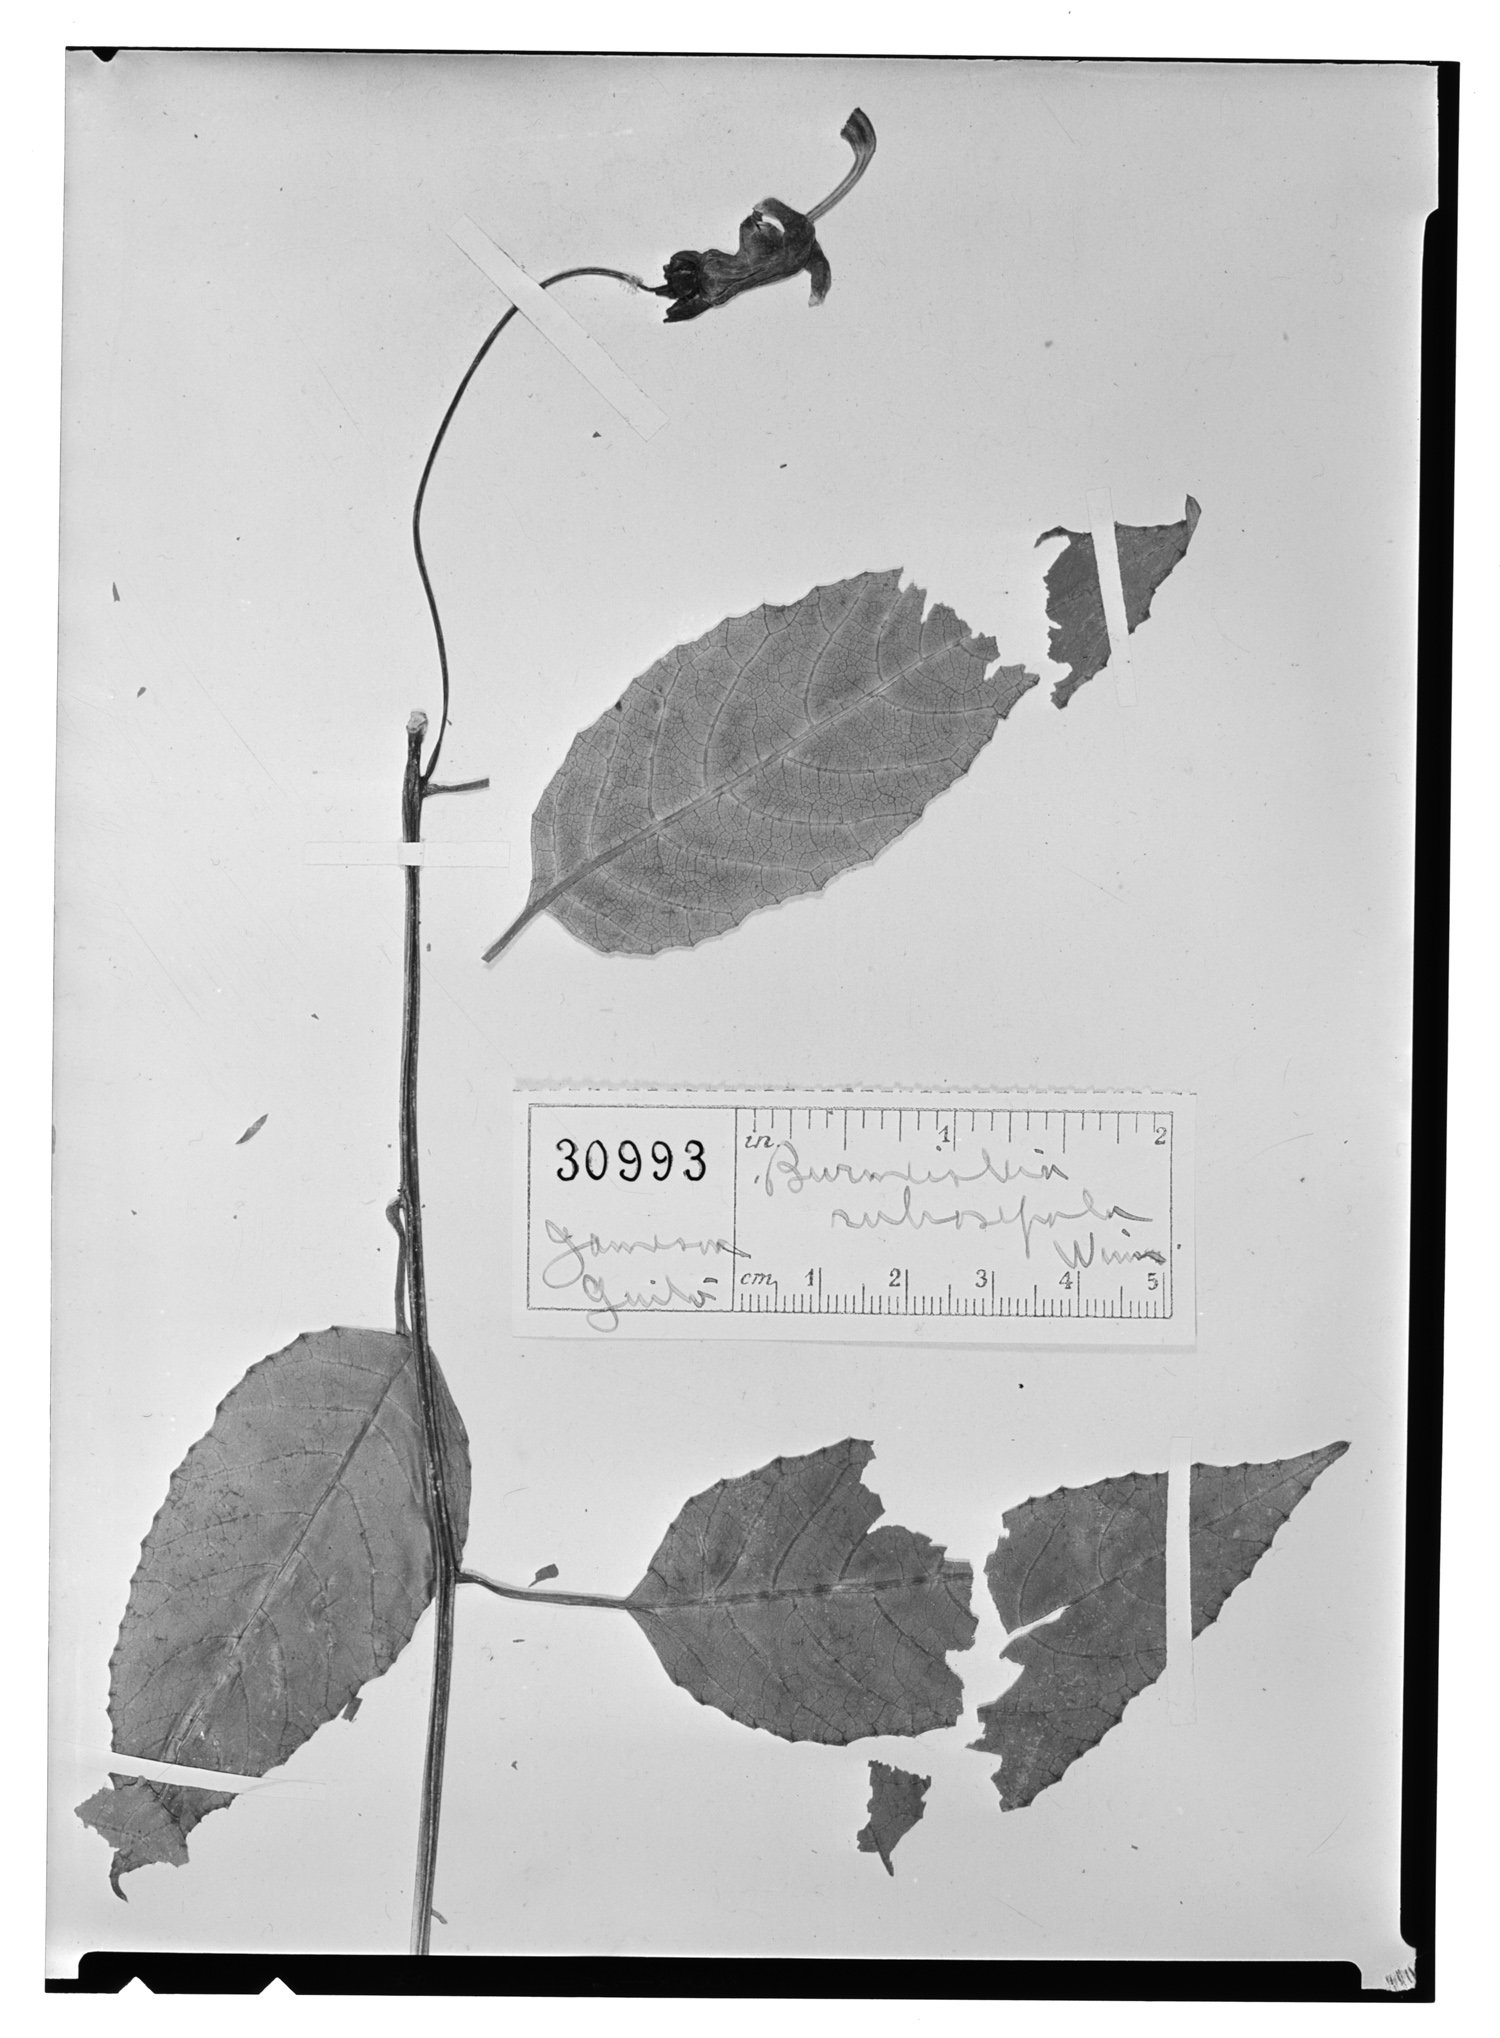 Burmeistera rubrosepala image